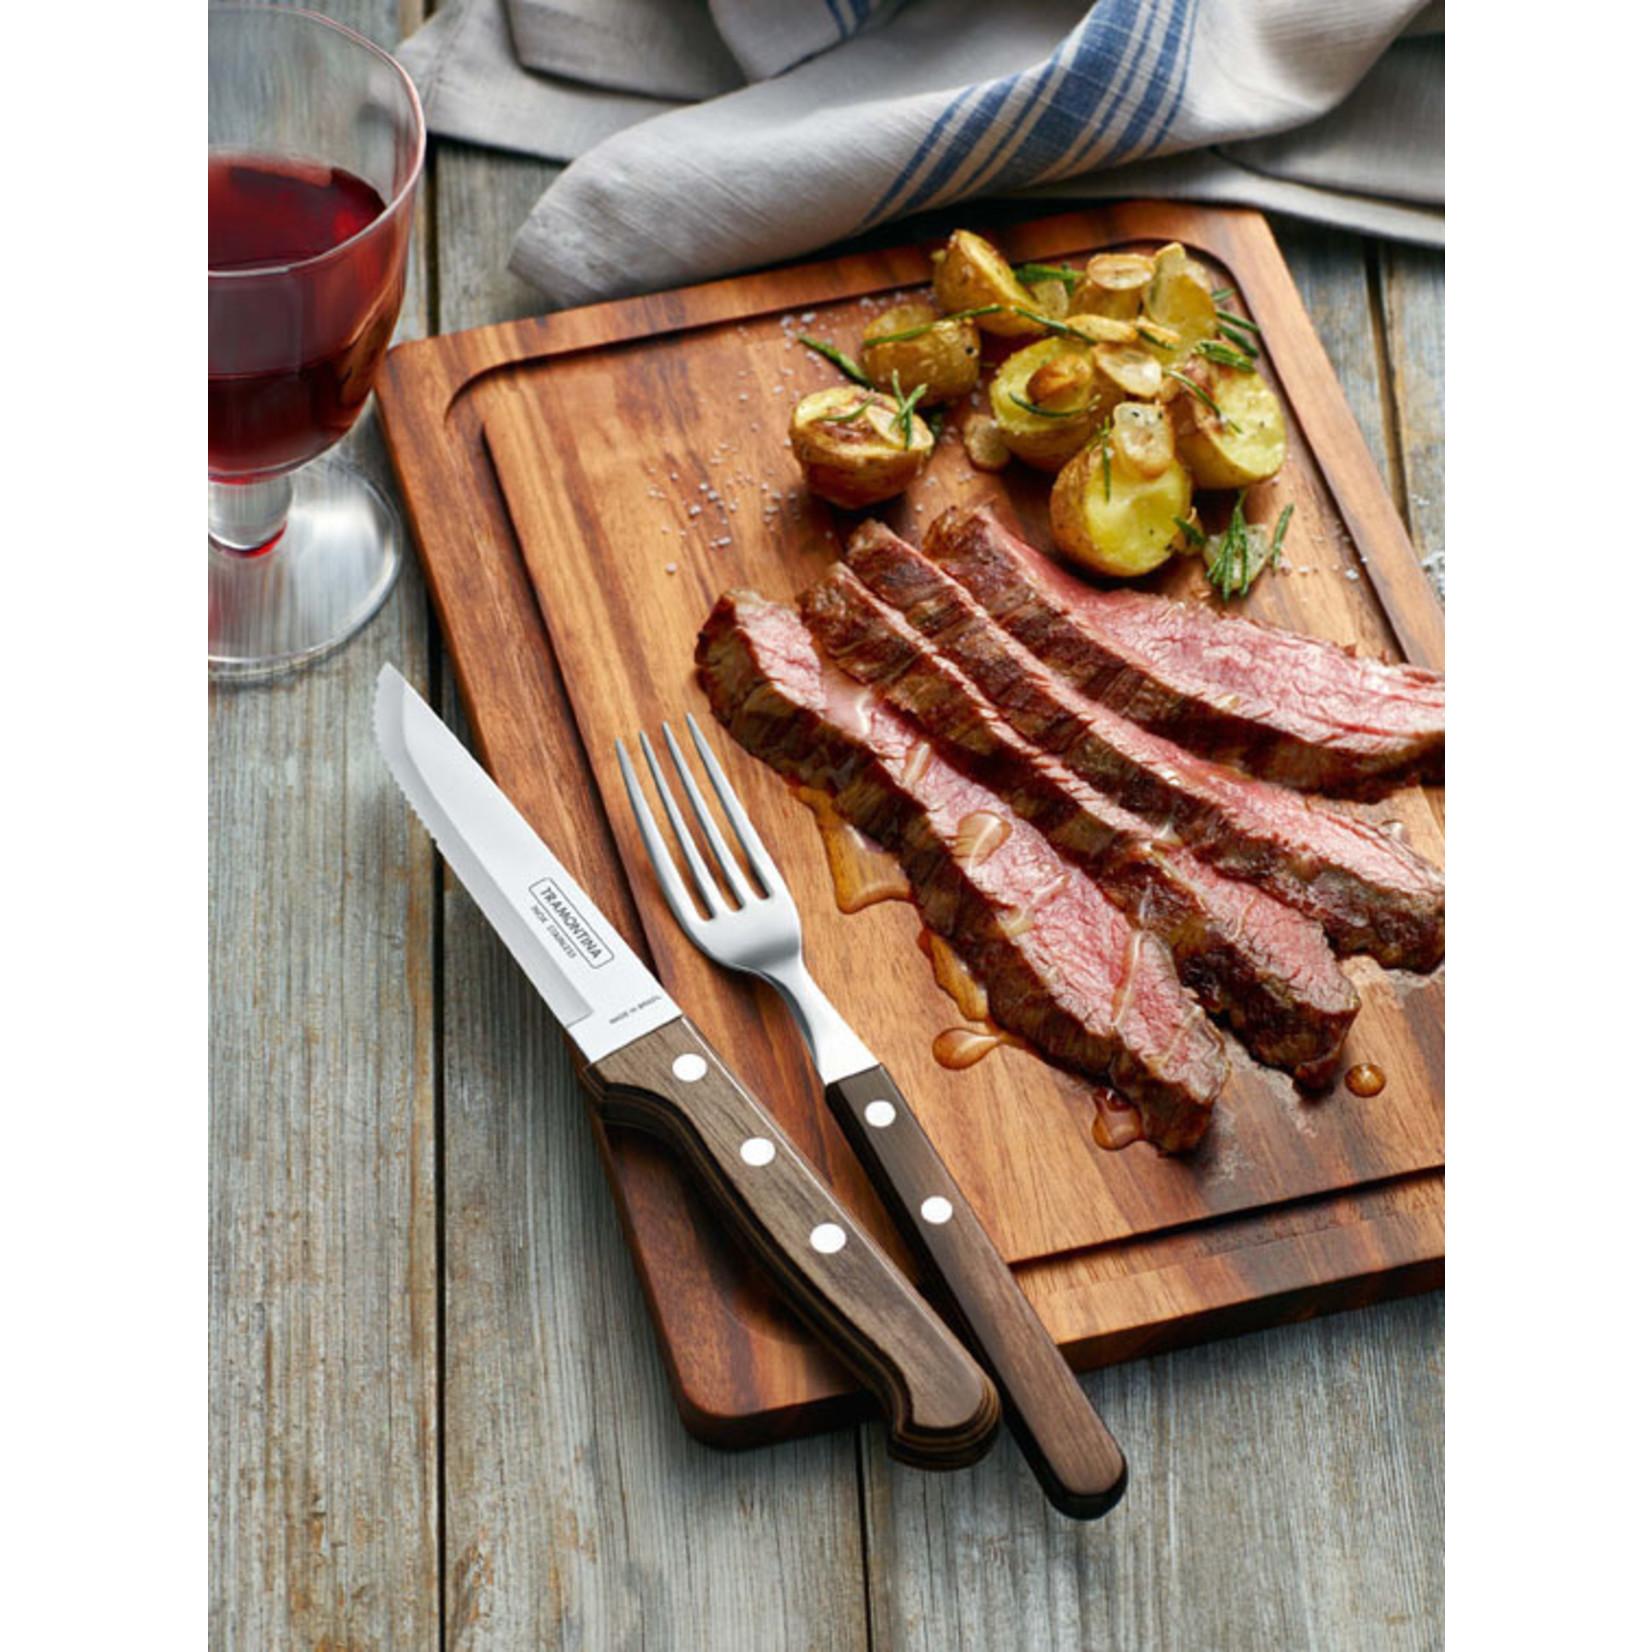 Tramontina Tramontina Churrasco steakmessenset Gaucho 6-delig bruin